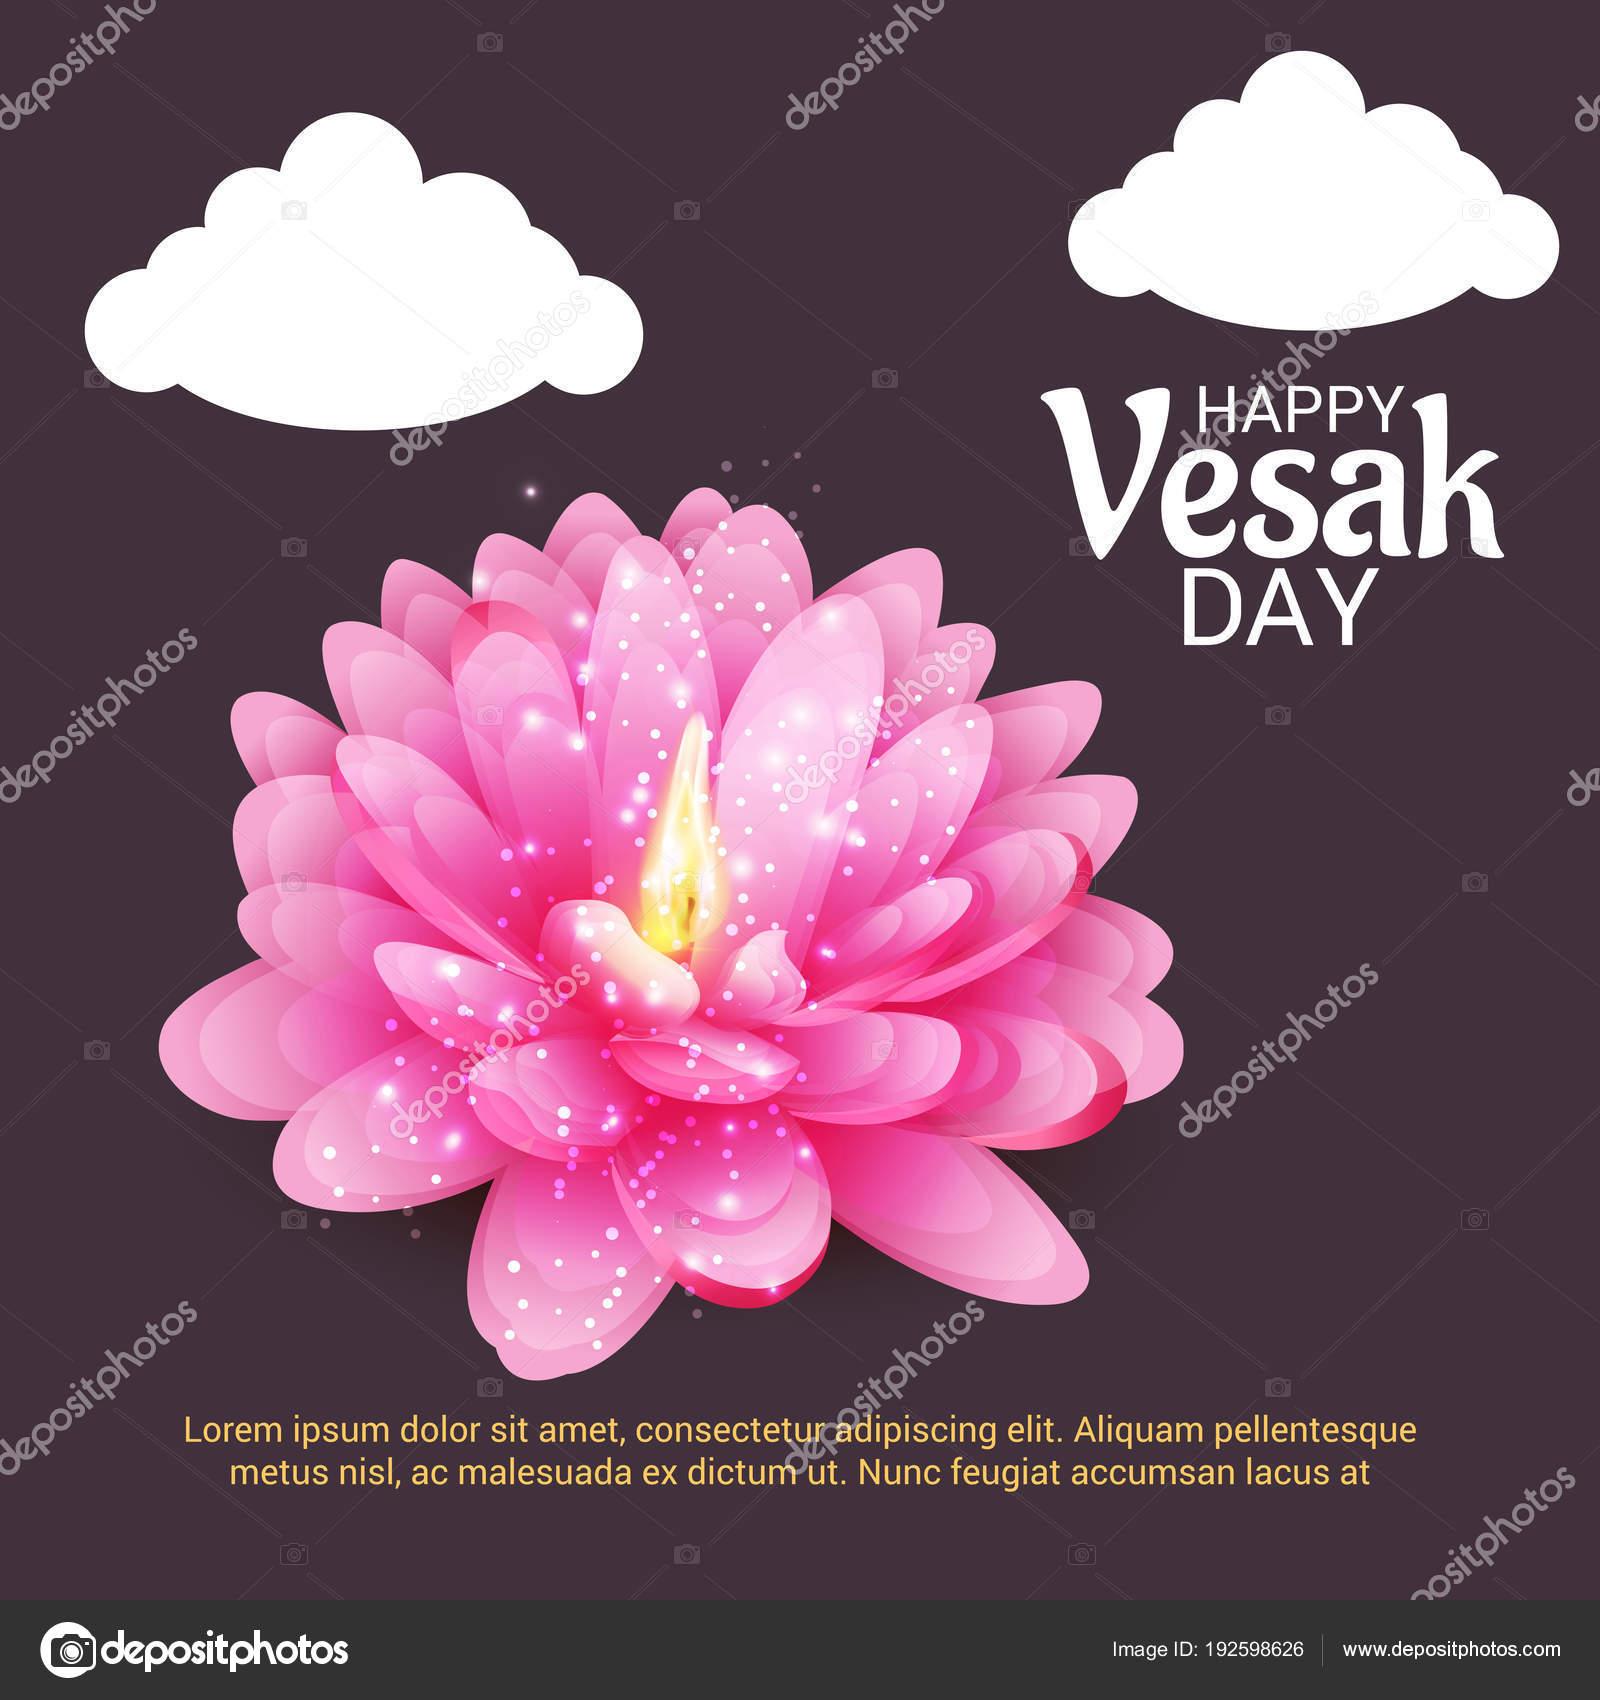 Vector Illustration Banner Vesak Day Pink Lotus Flower Stock